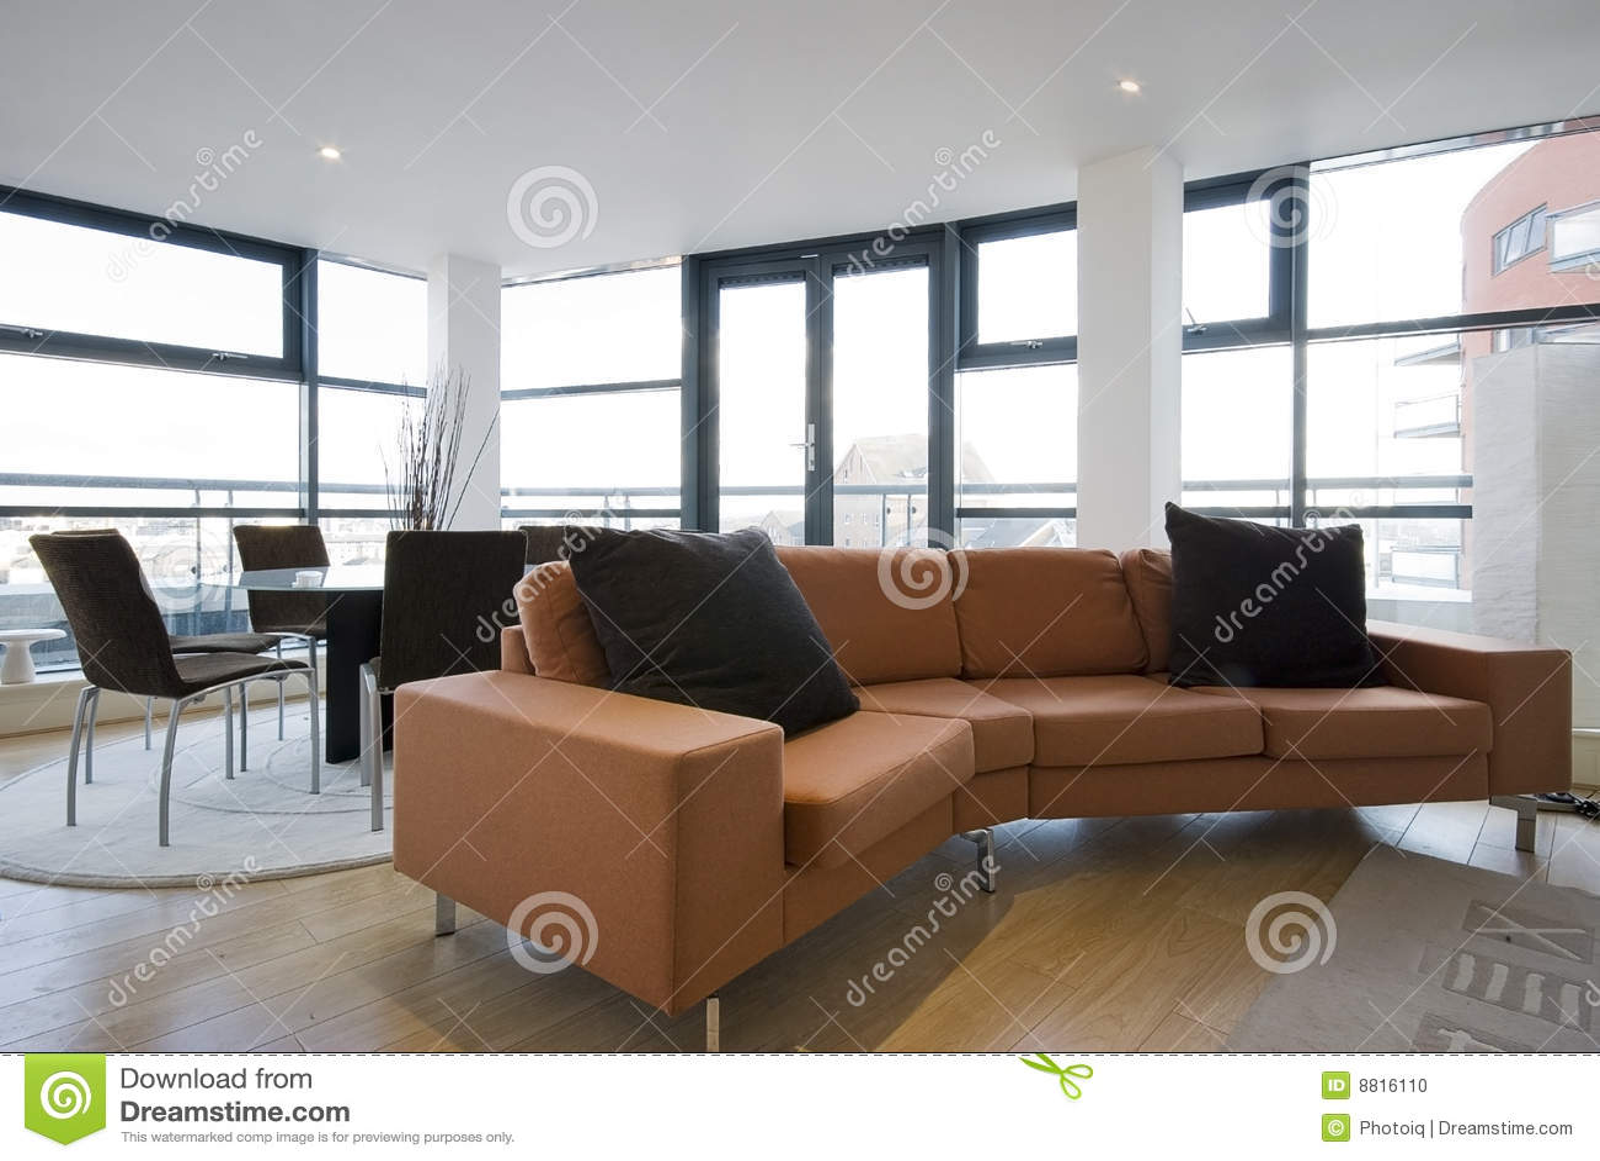 Design Bank Oranje.Livingroom With Large Orange Sofa Stock Photo Image Of Apartment